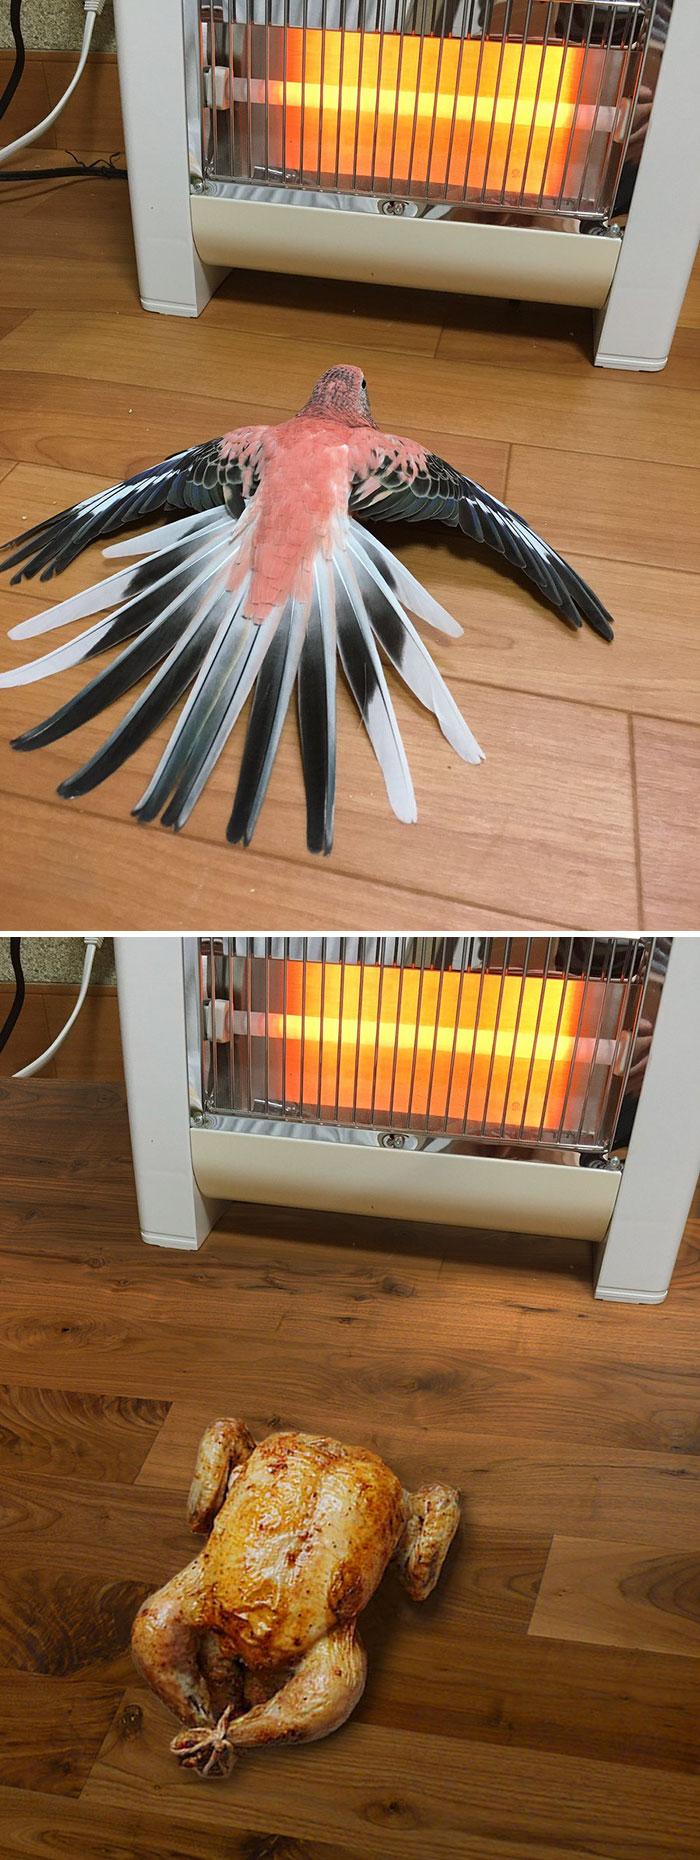 Bird By A Space Heater